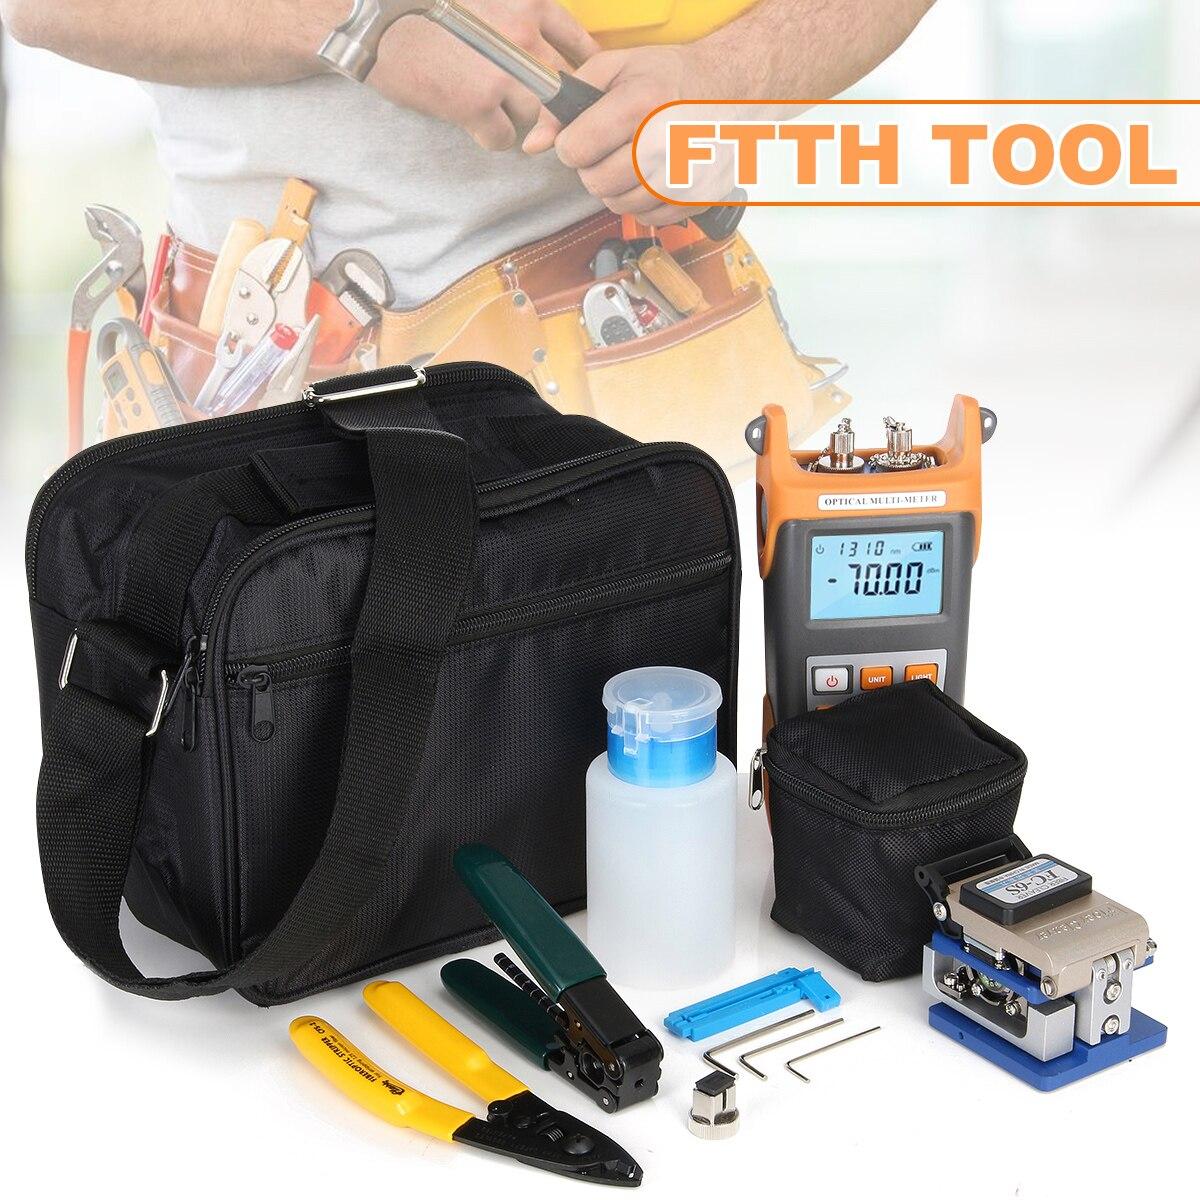 Für SGV305 Faser Ftth Tool Kit Fiber Cleaver Optische Power Visuelle Finder Locator Draht stripper